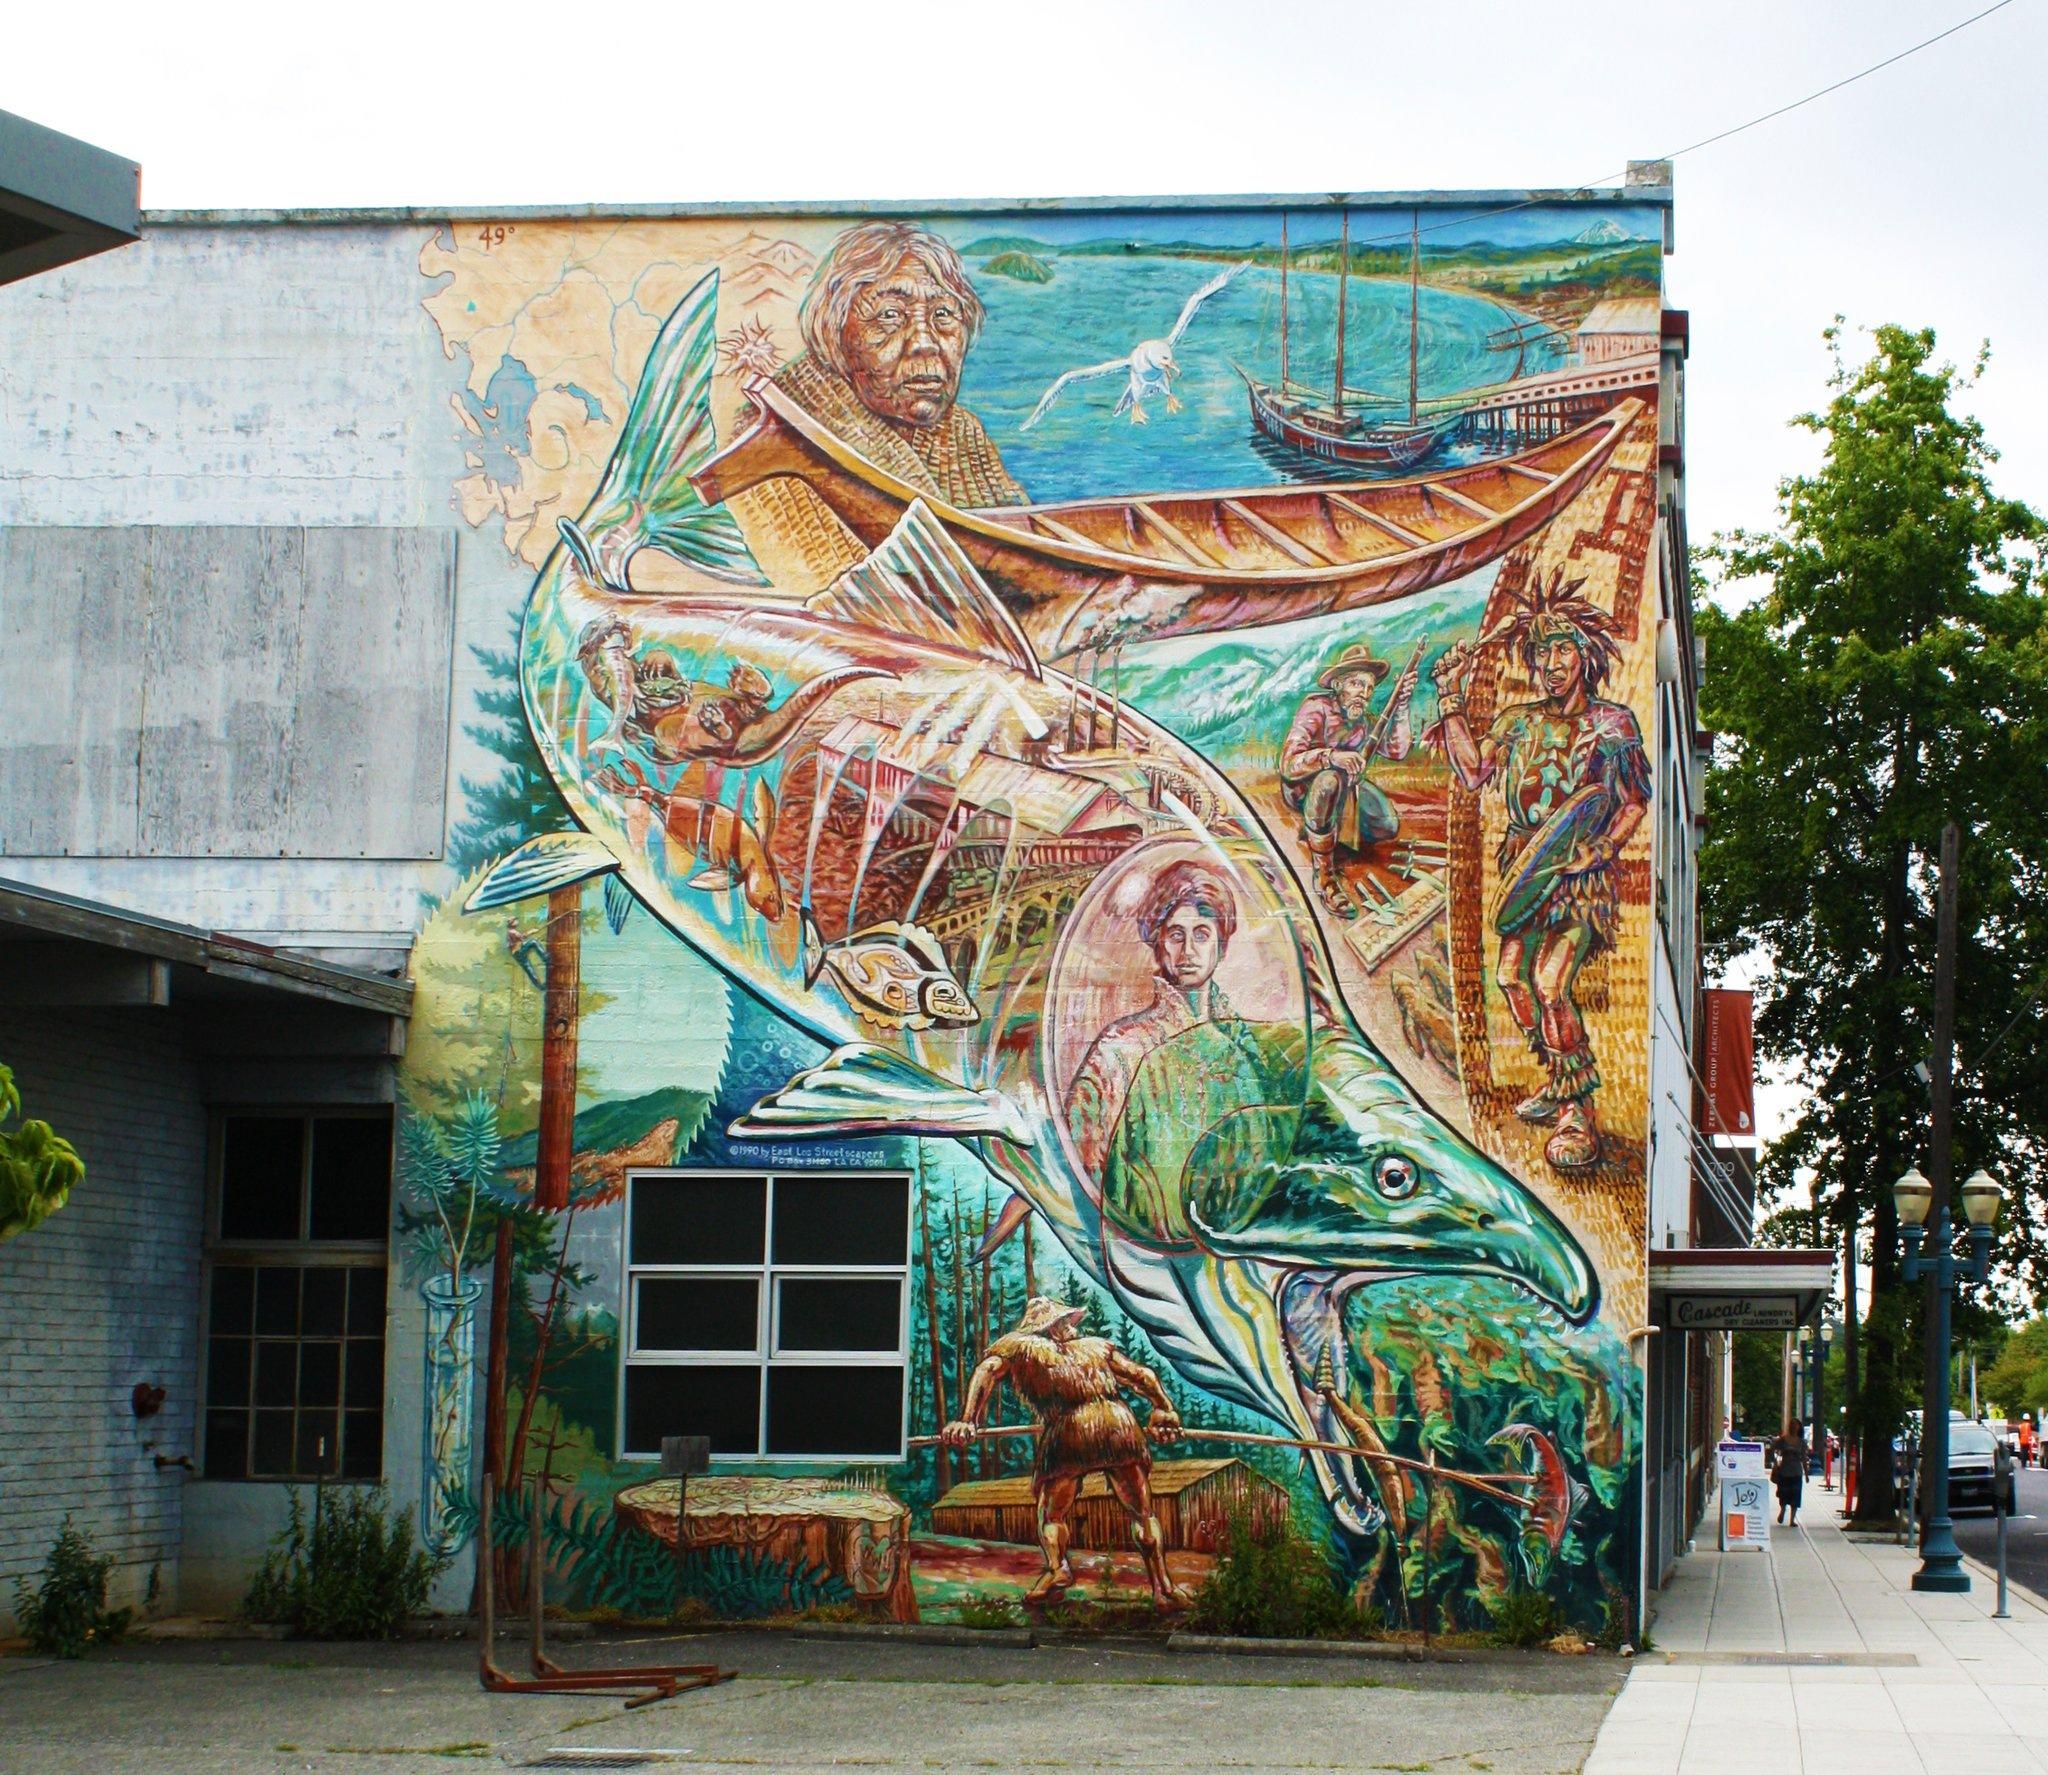 Street Art by Donald Bruce Edward Wilson